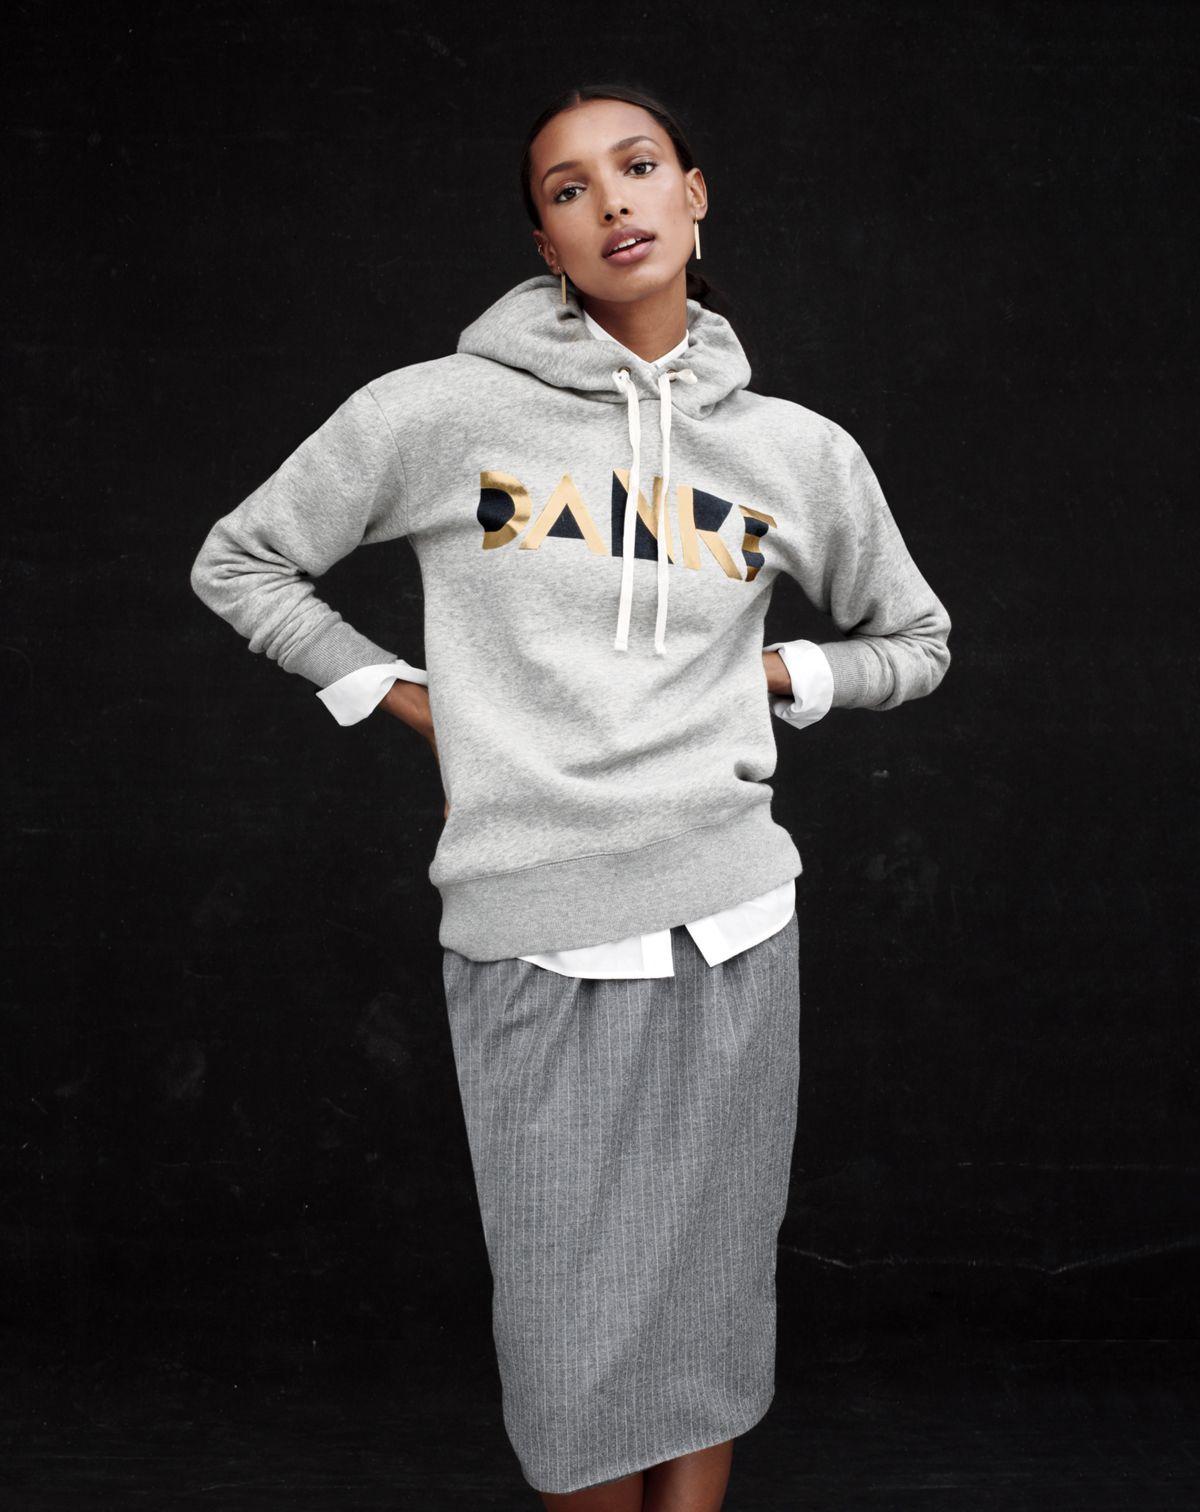 J.Crew women's hooded sweatshirt, pull-on pinstripe skirt,